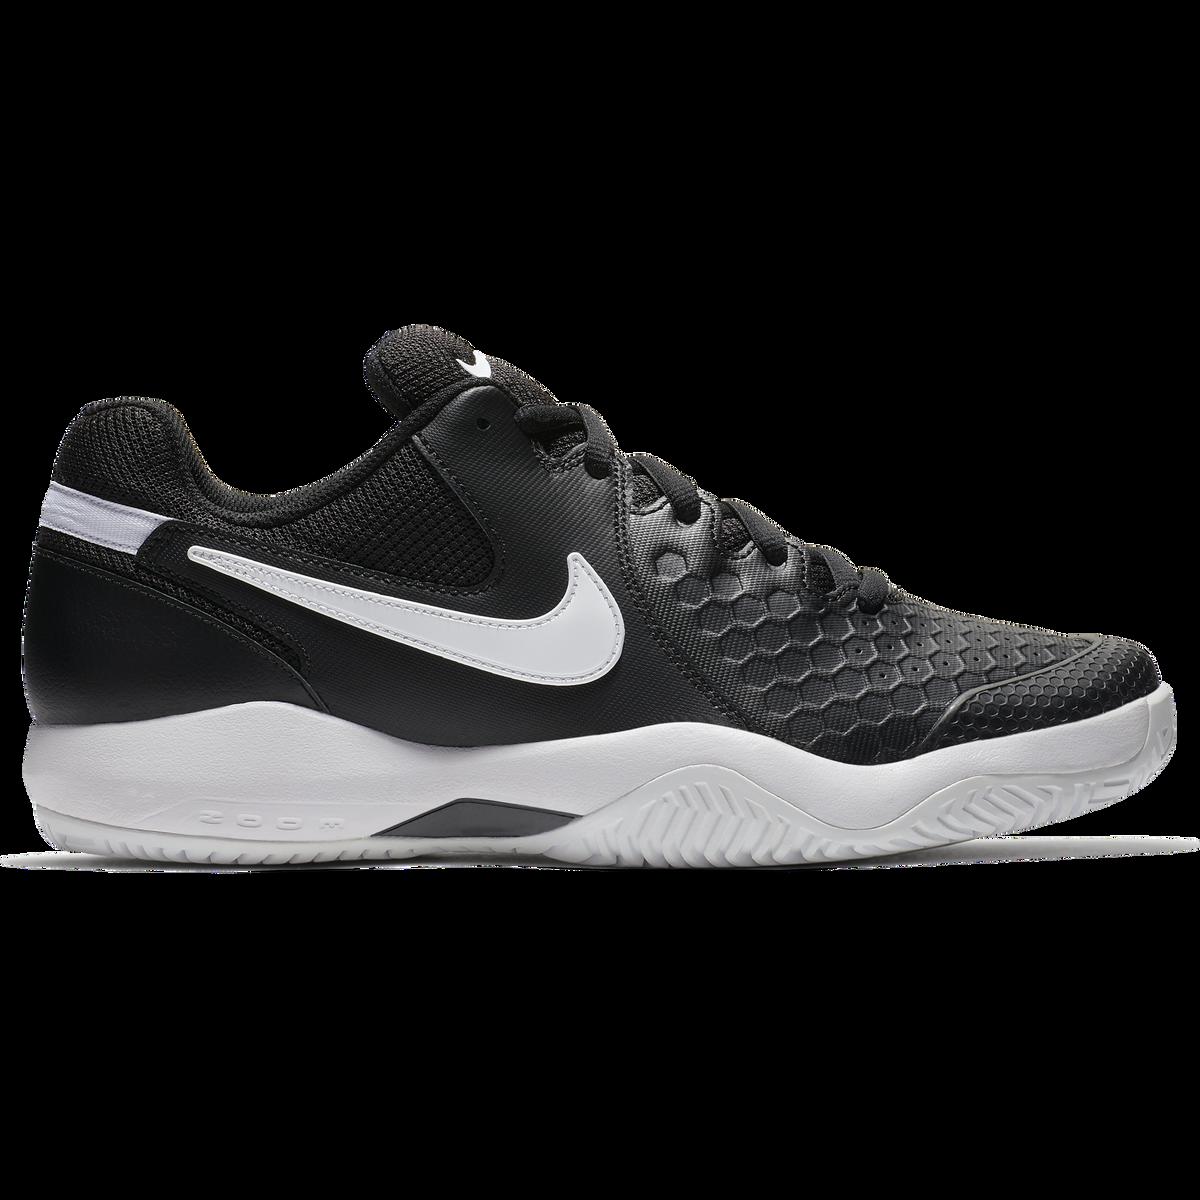 b12973f2027e Nike Air Zoom Resistance Men s Tennis Shoe - Black White